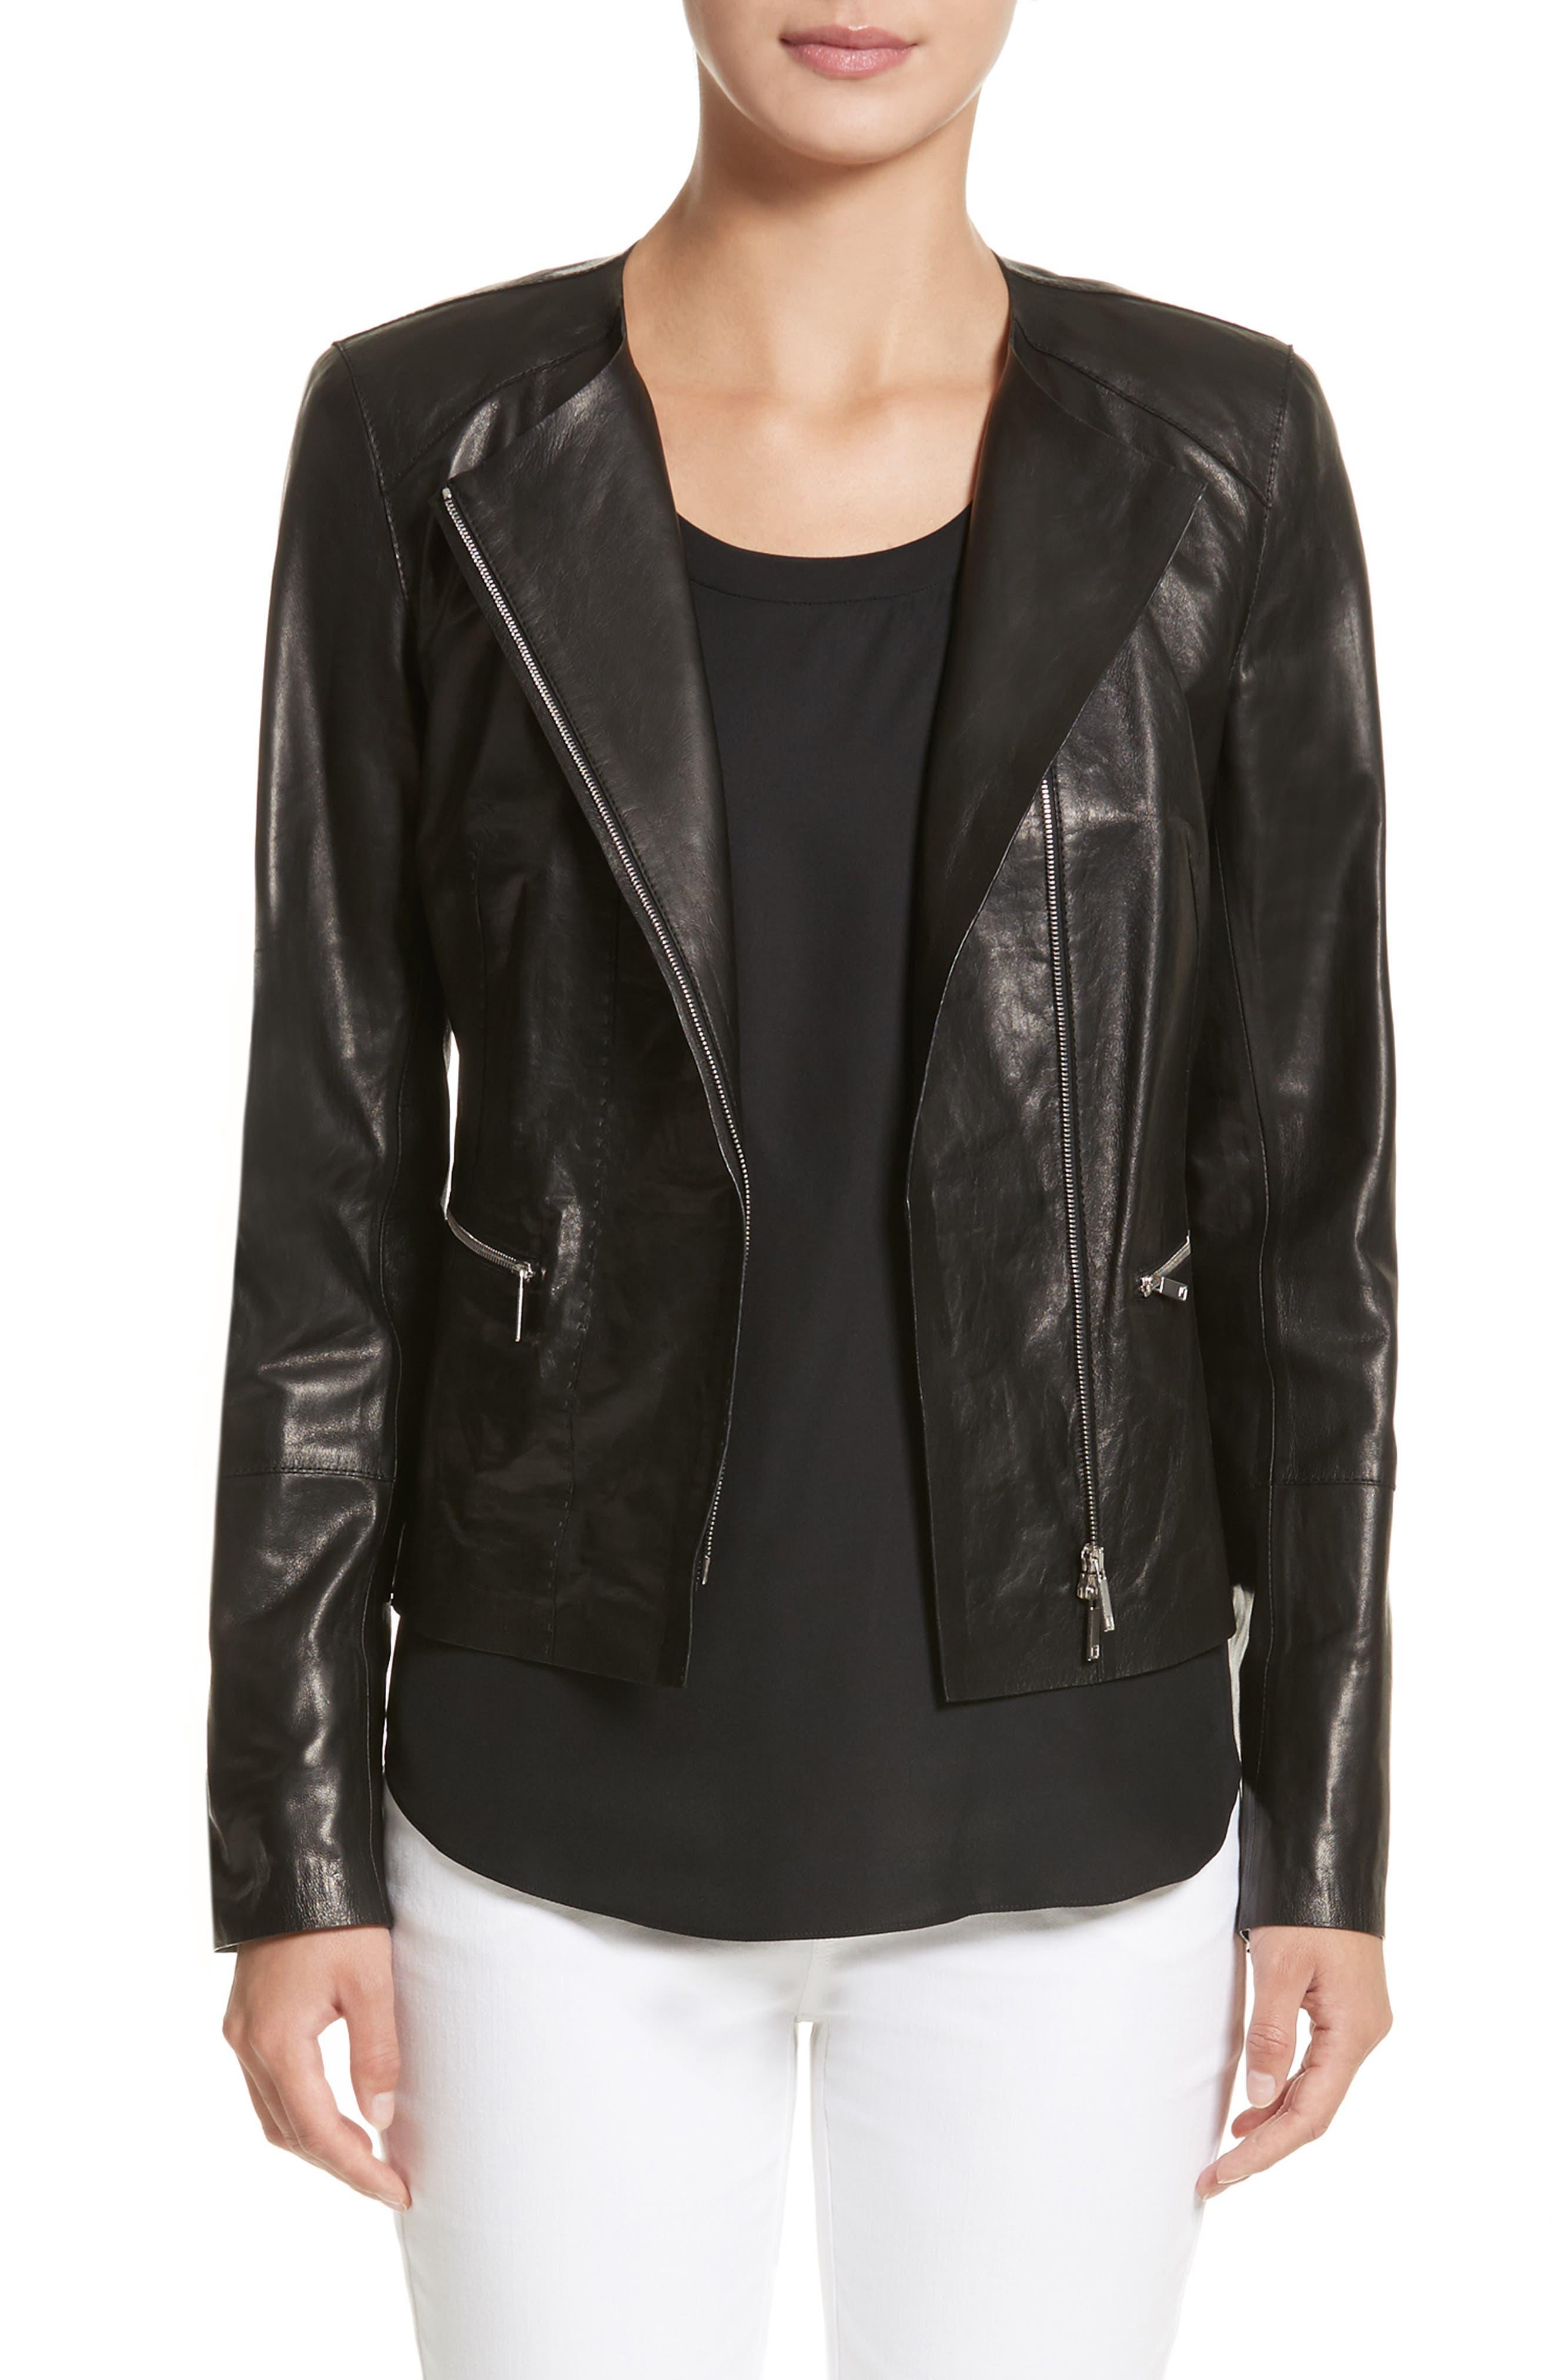 Caridee Glazed Lambskin Leather Jacket,                             Main thumbnail 1, color,                             001